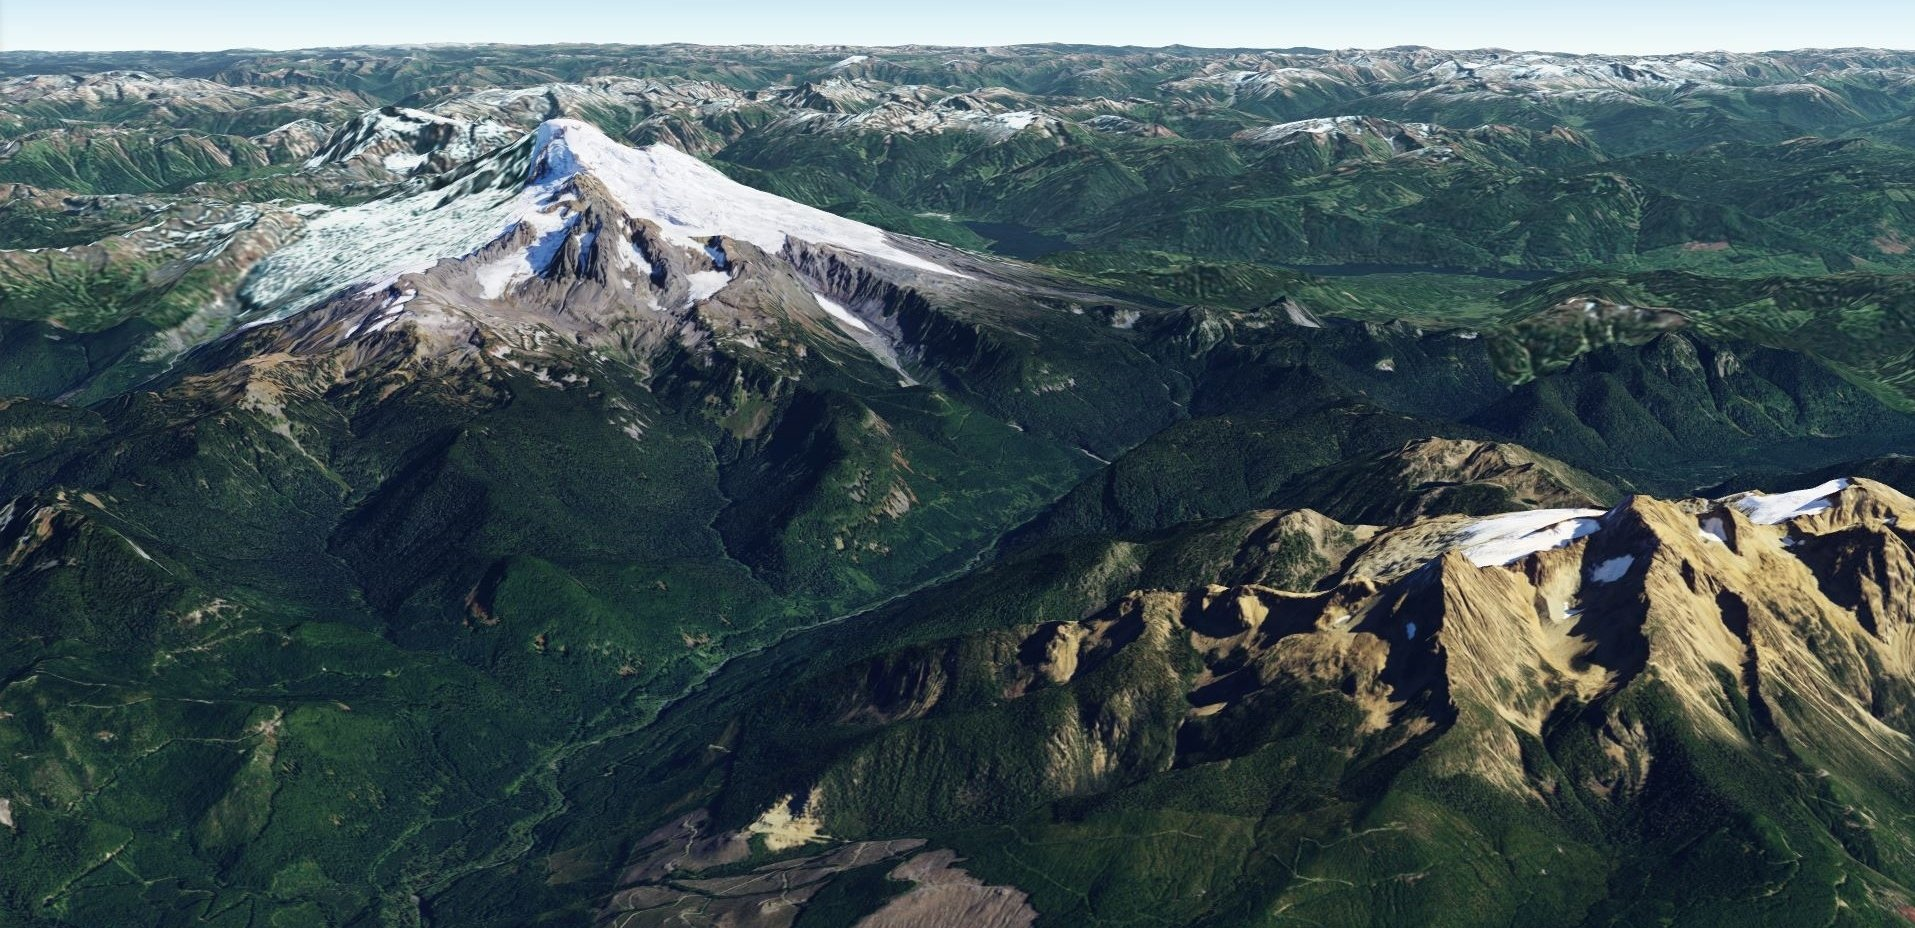 ArcGIS 3D Map of Mt Baker